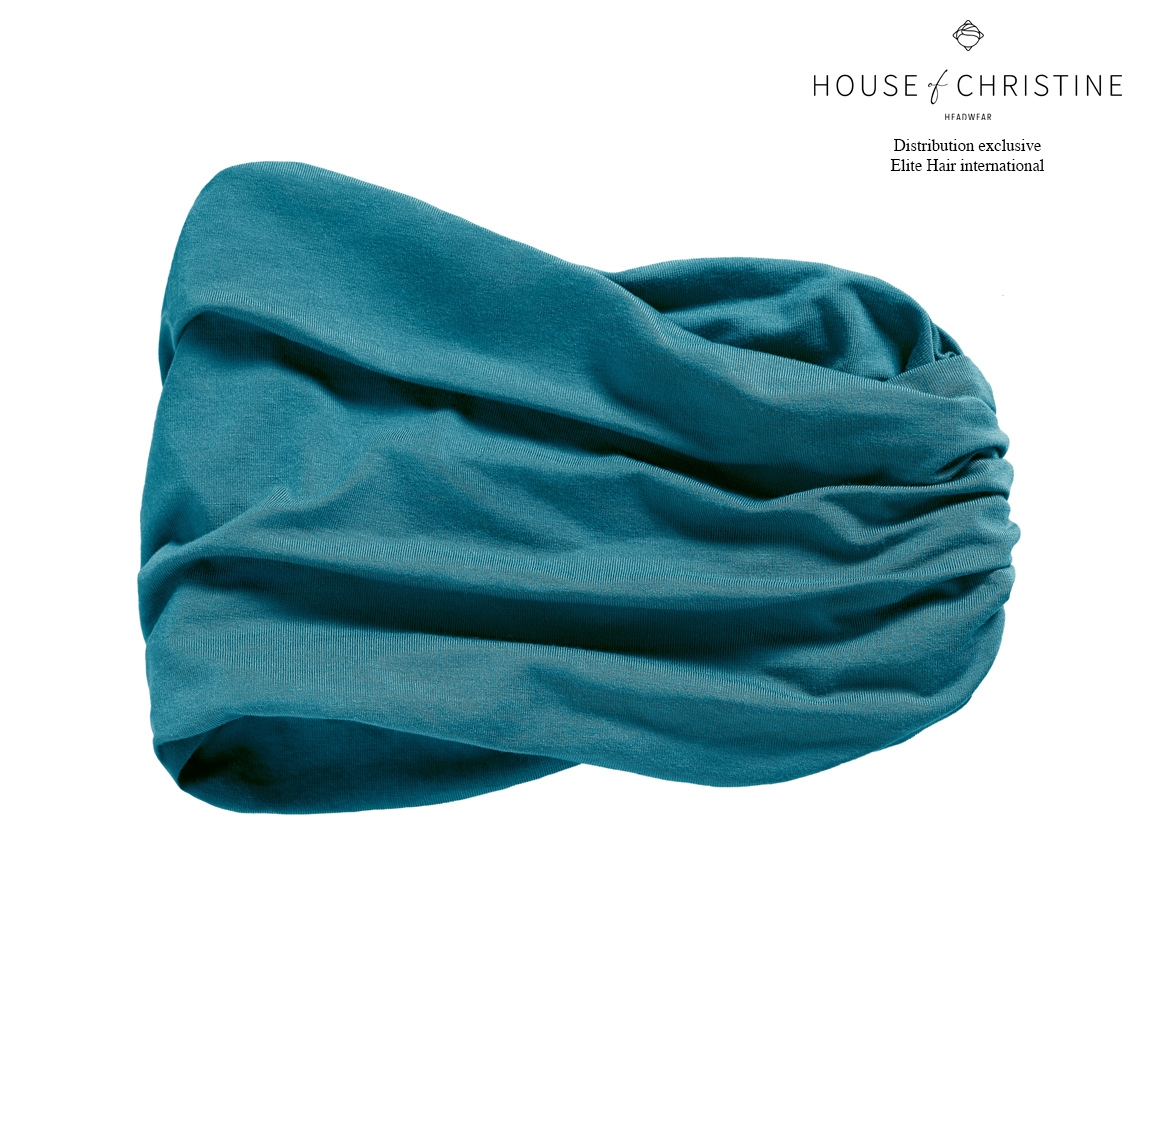 Bandeau chimio karma, bleu pétrole, christine headwear